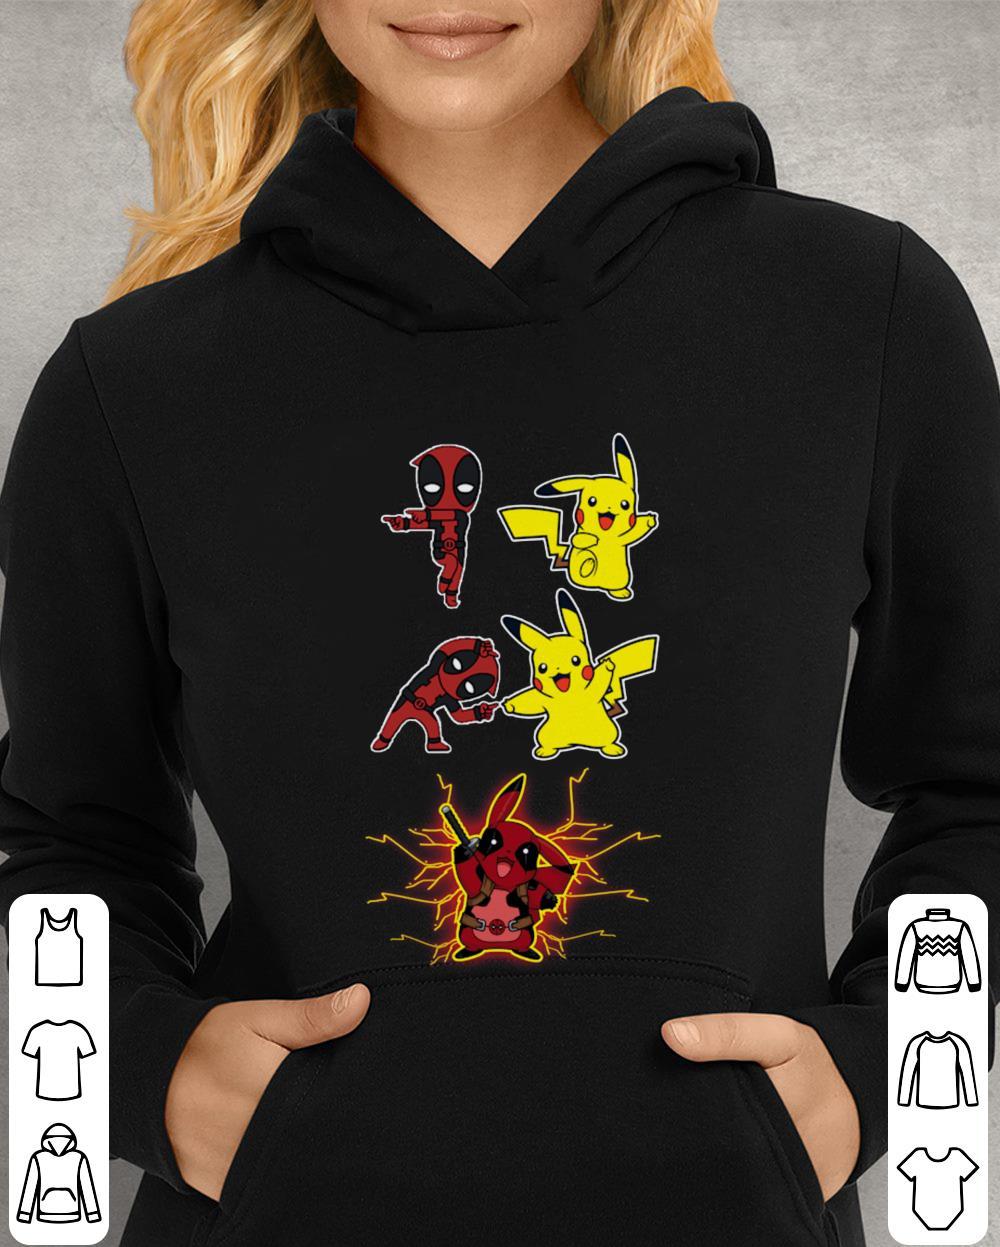 https://unicornshirts.net/images/2018/12/Deadpool-become-Pikachu-Pokemon-shirt_4.jpg